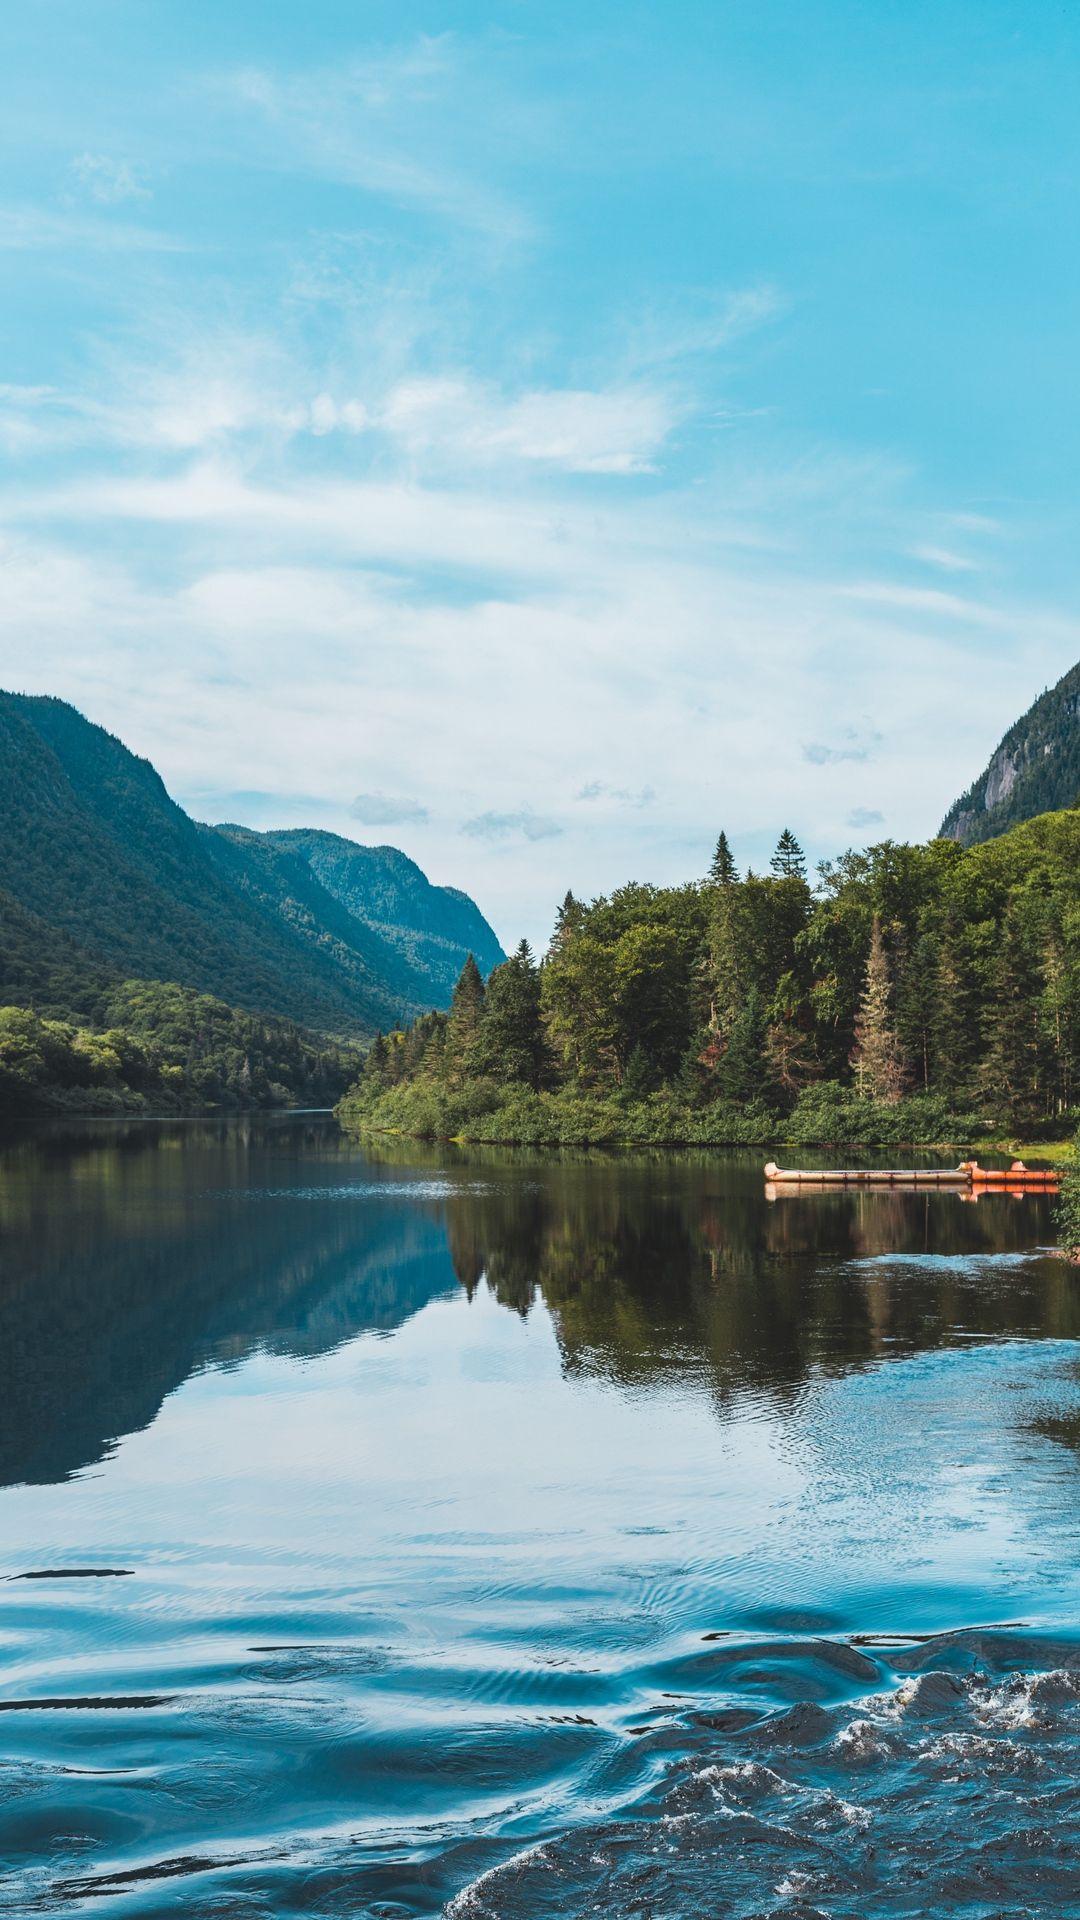 480 800 Mountain Forest Landscape